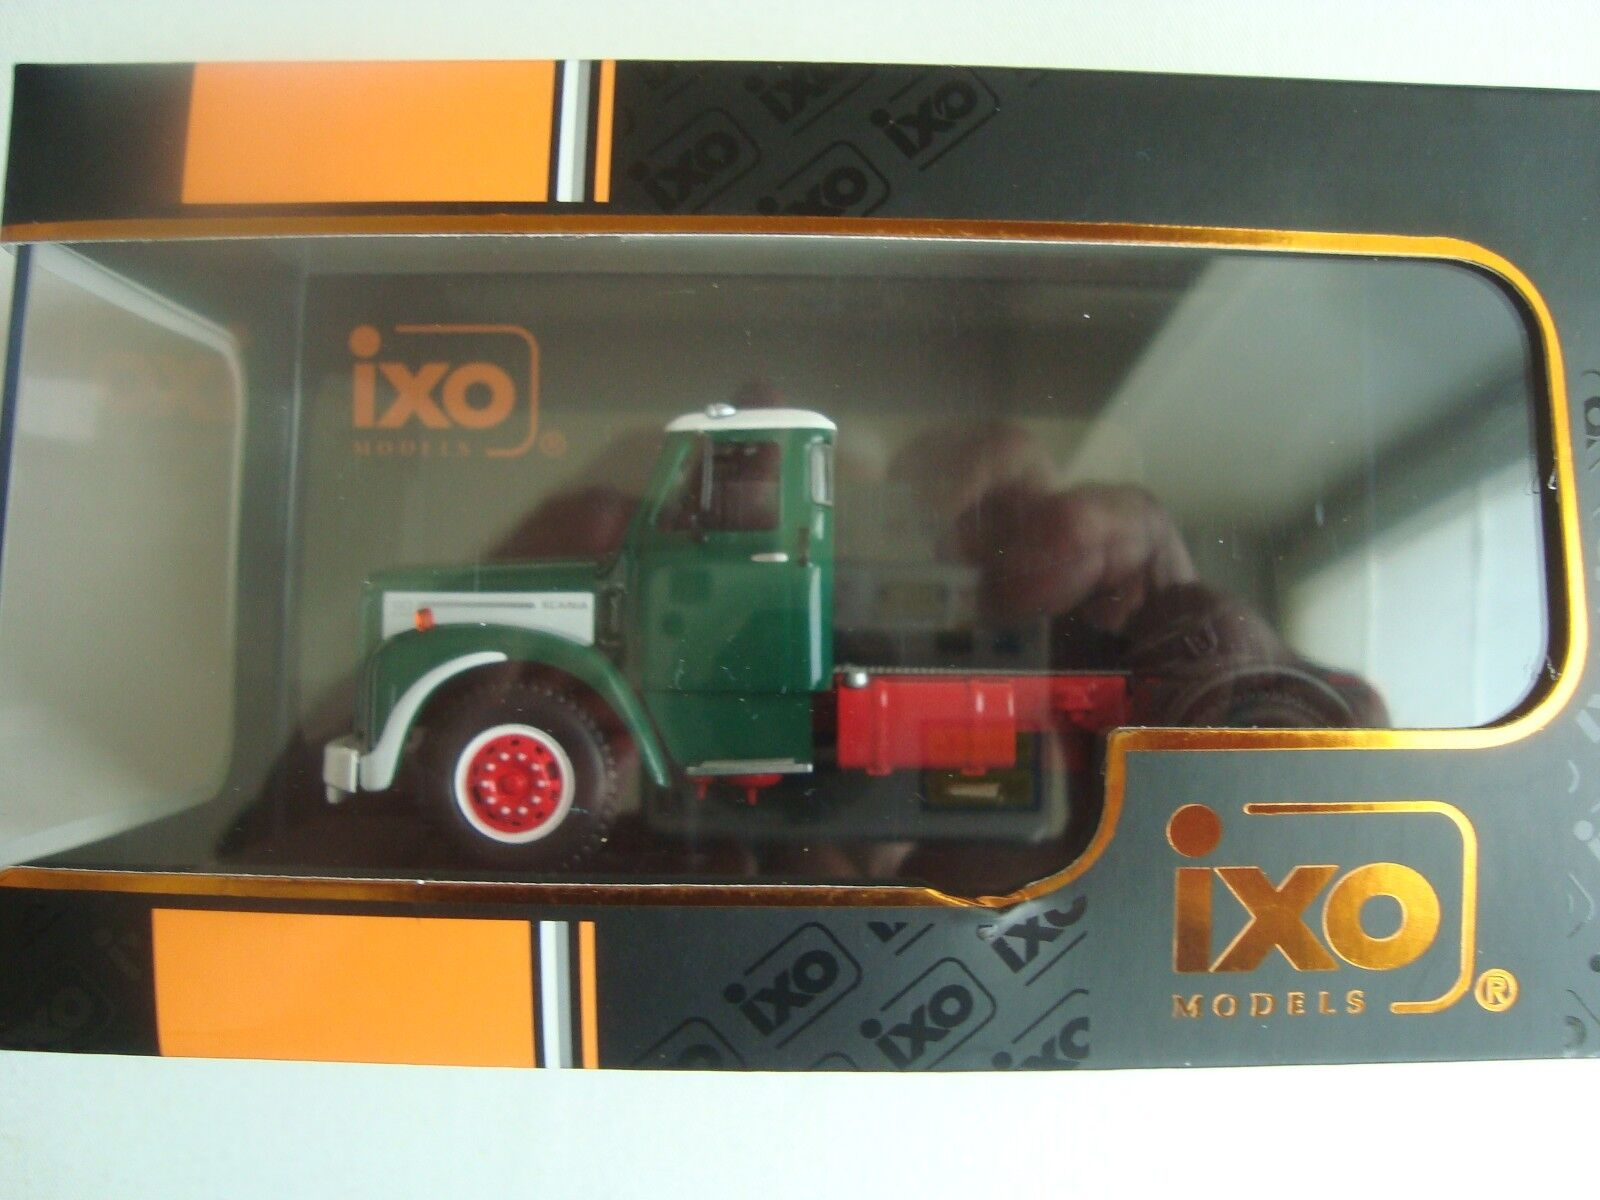 NEW LASTWAGEN SCANIA 110 green white IXO TR 014 1953 IN SCHACHTEL PLEXI